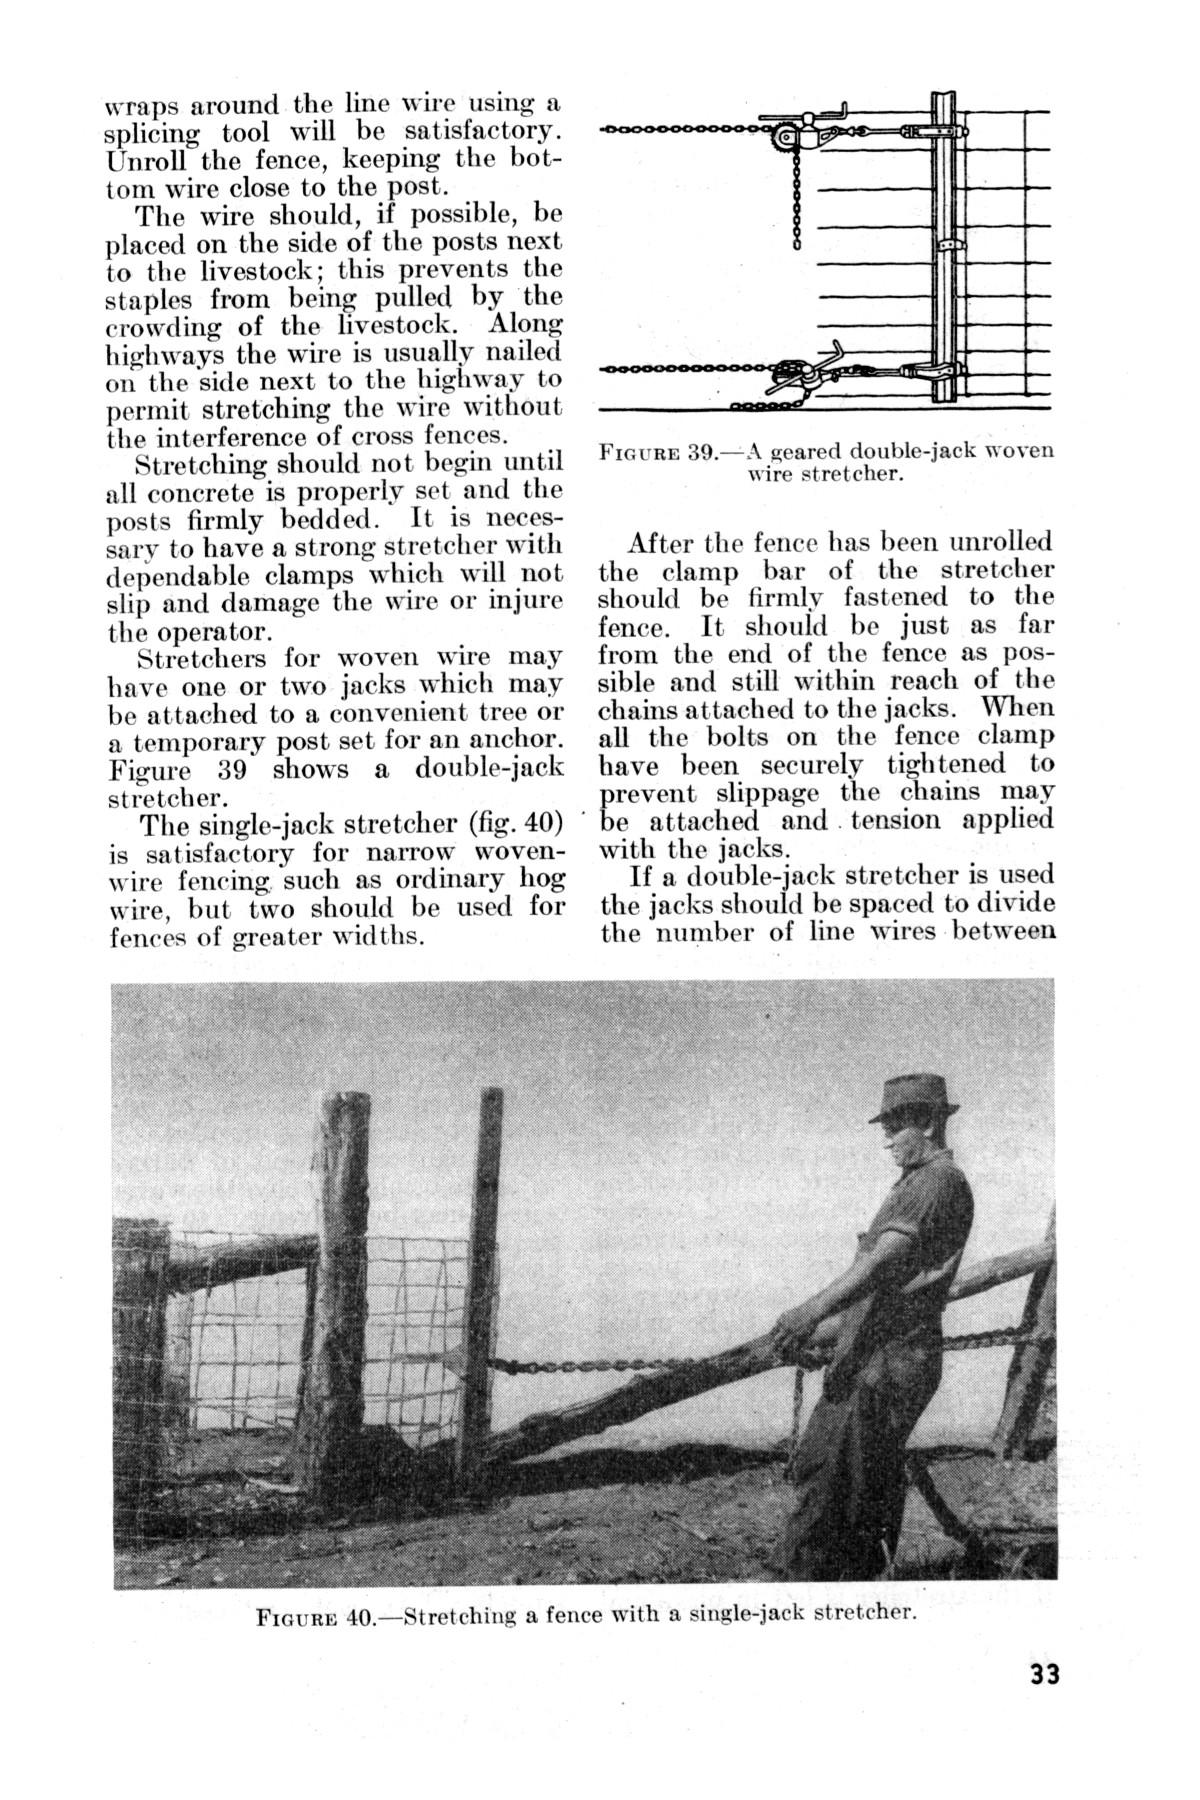 Farm fences. - Page 33 - Digital Library